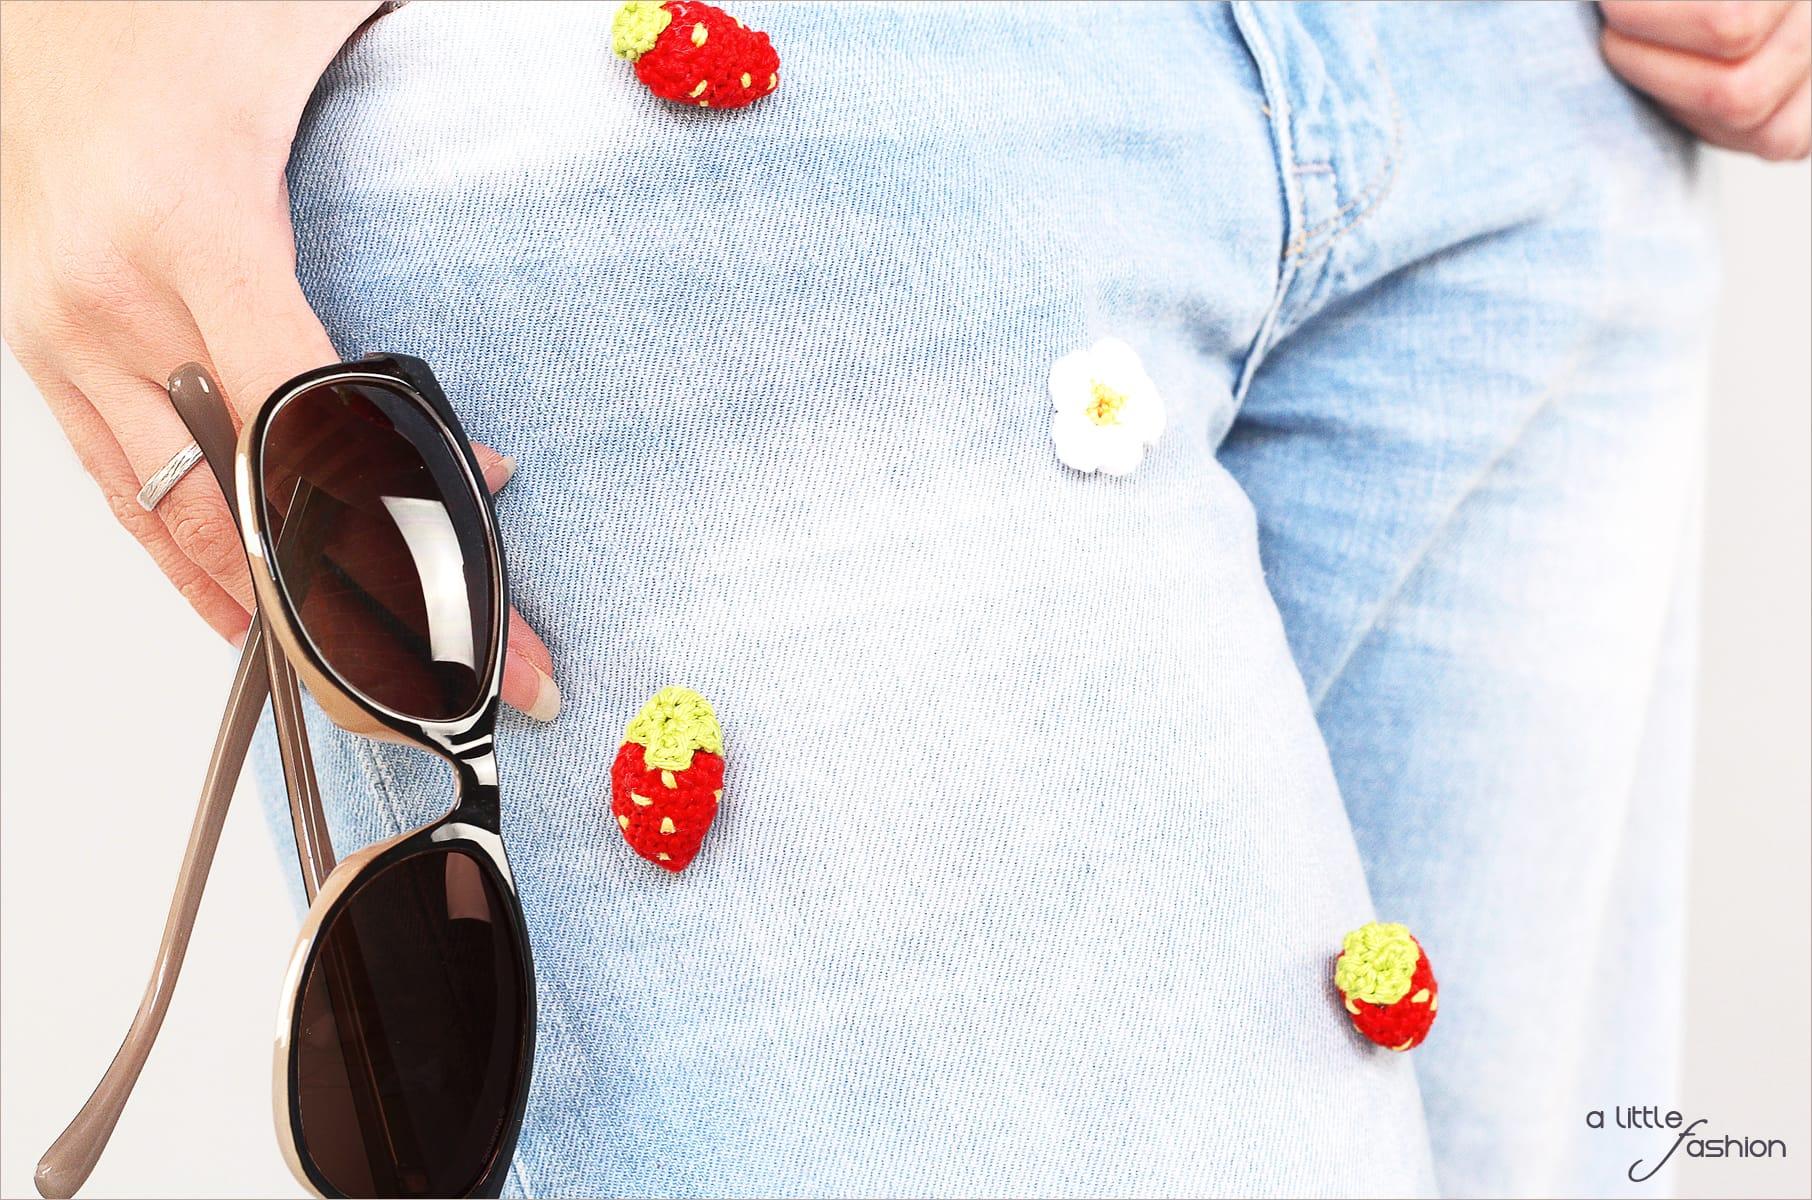 Patched Boyfriend Jeans mit Pumps und Shirt | A Little Fashion | https://www.filizity.com/fashion/patched-boyfriend-jeans-mit-pumps-und-shirt